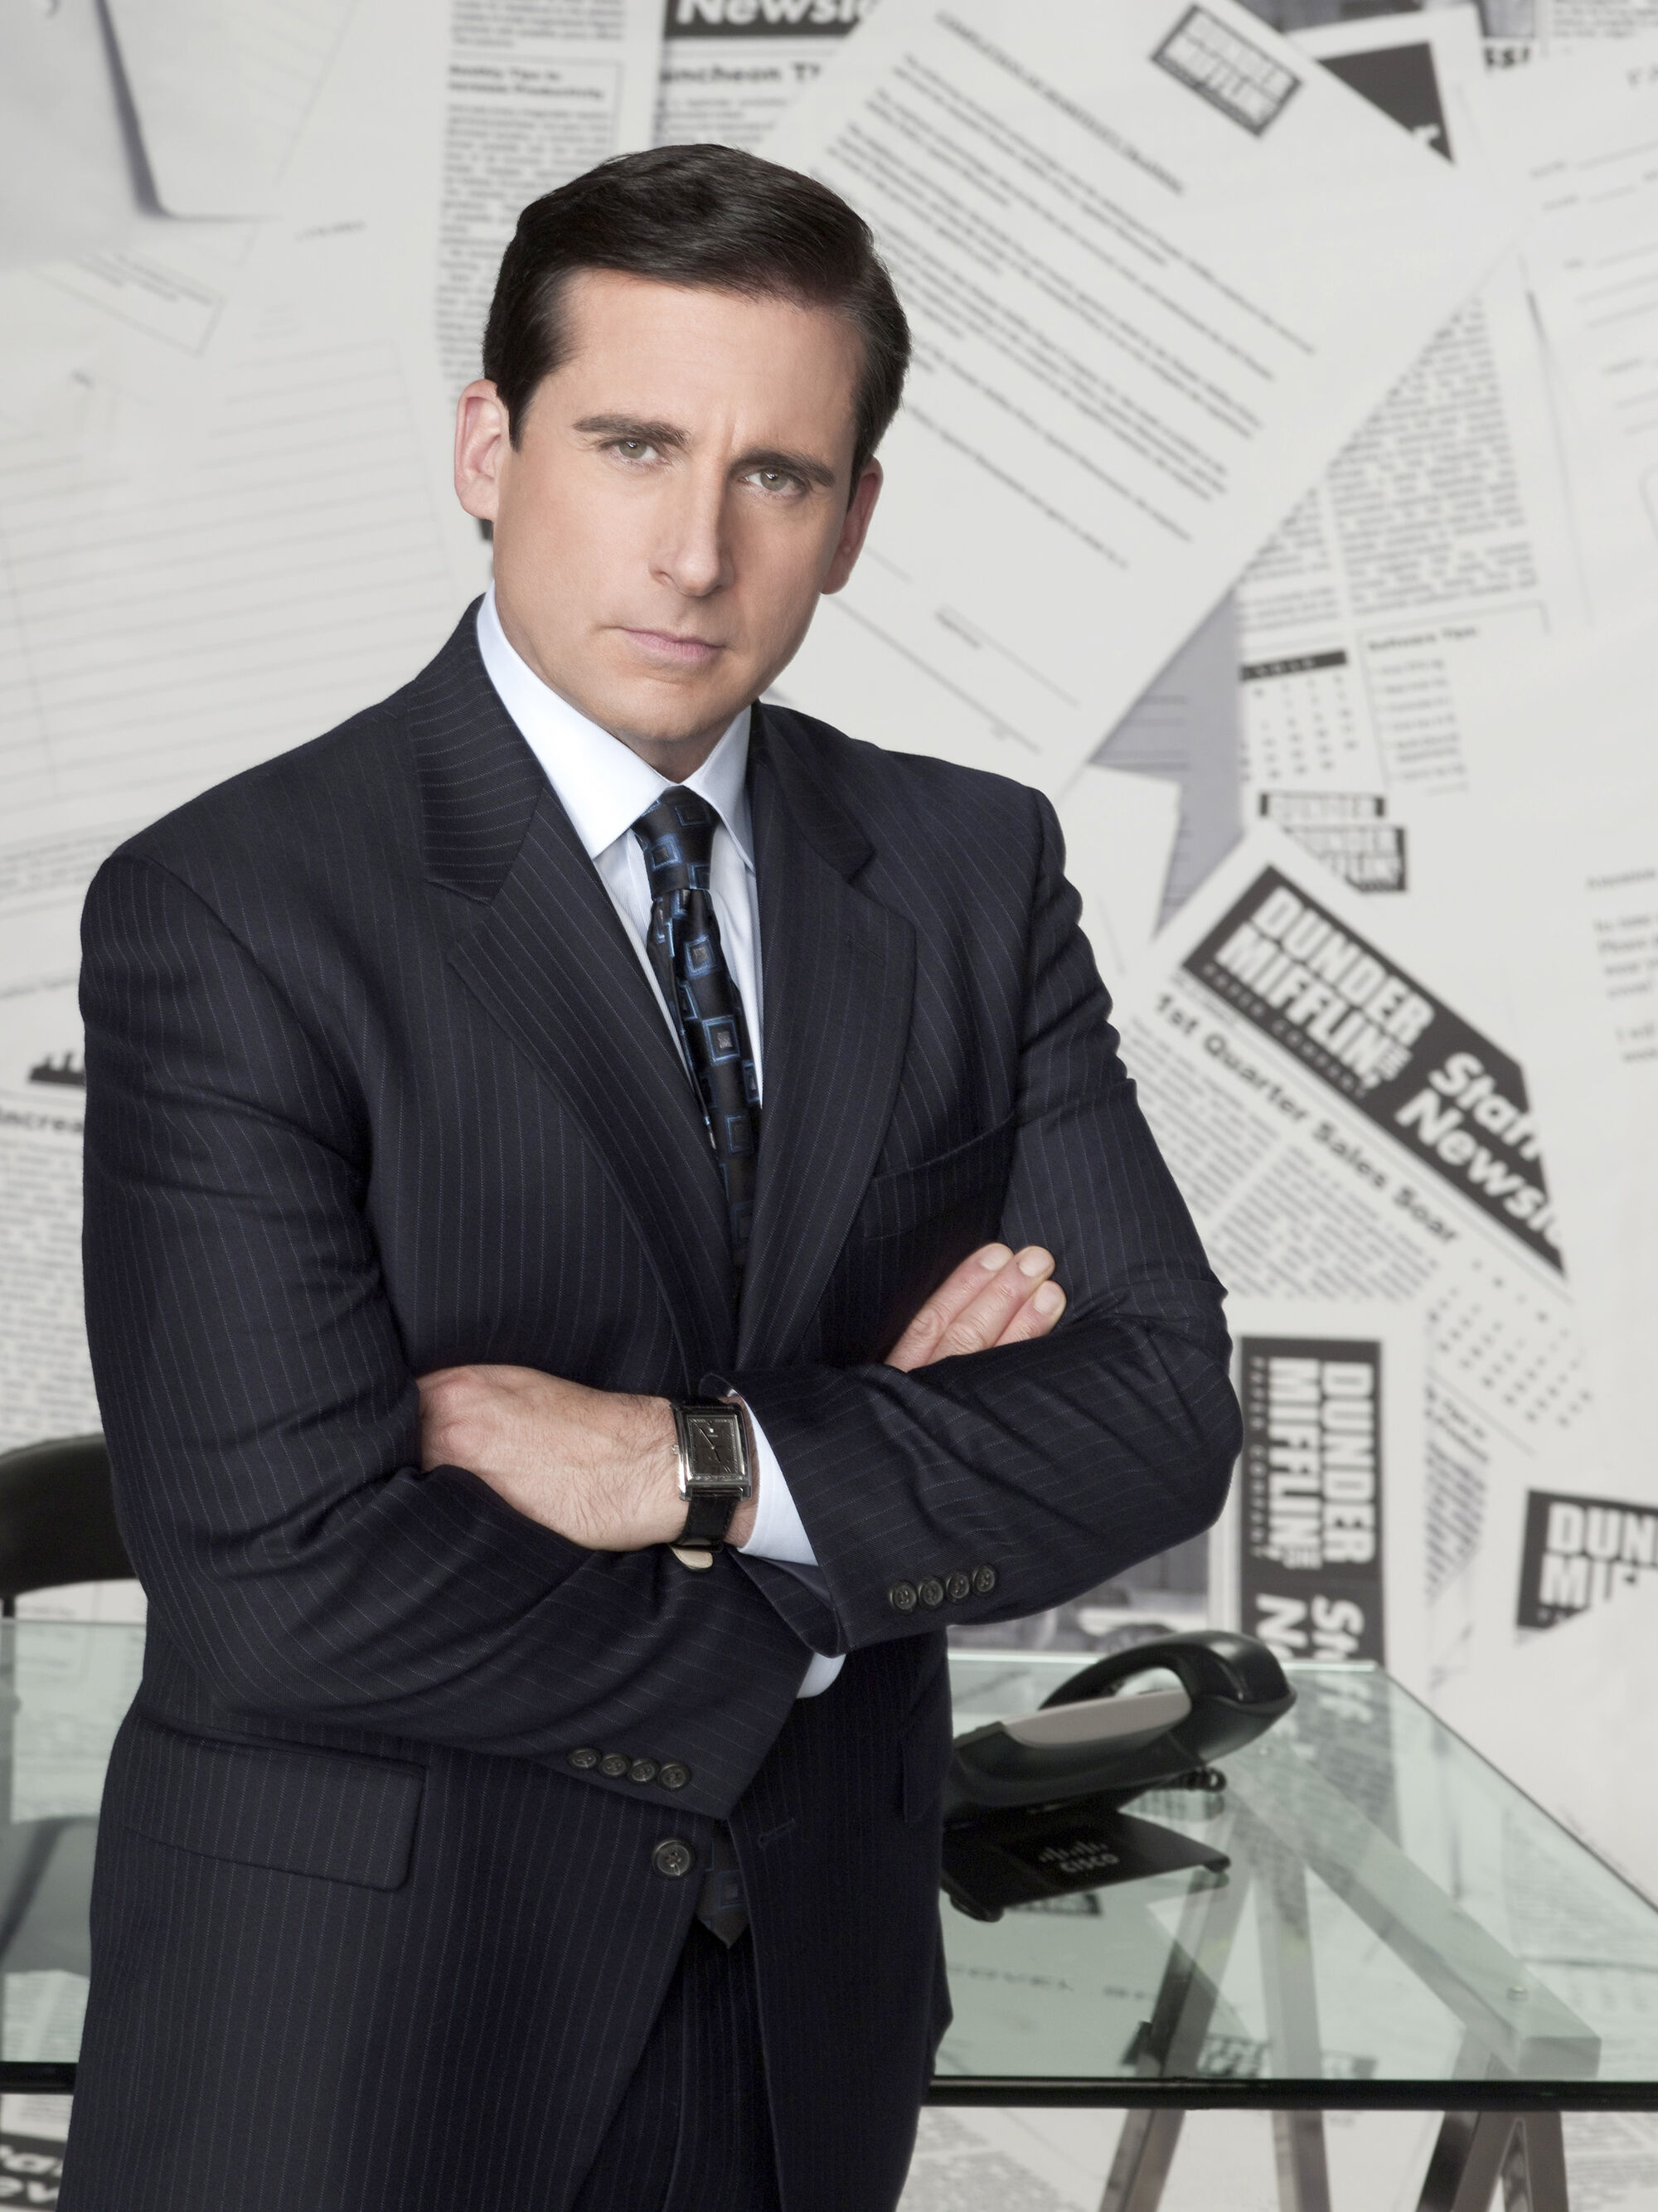 Michael Scott | Dunderpedia: The Office Wiki | FANDOM